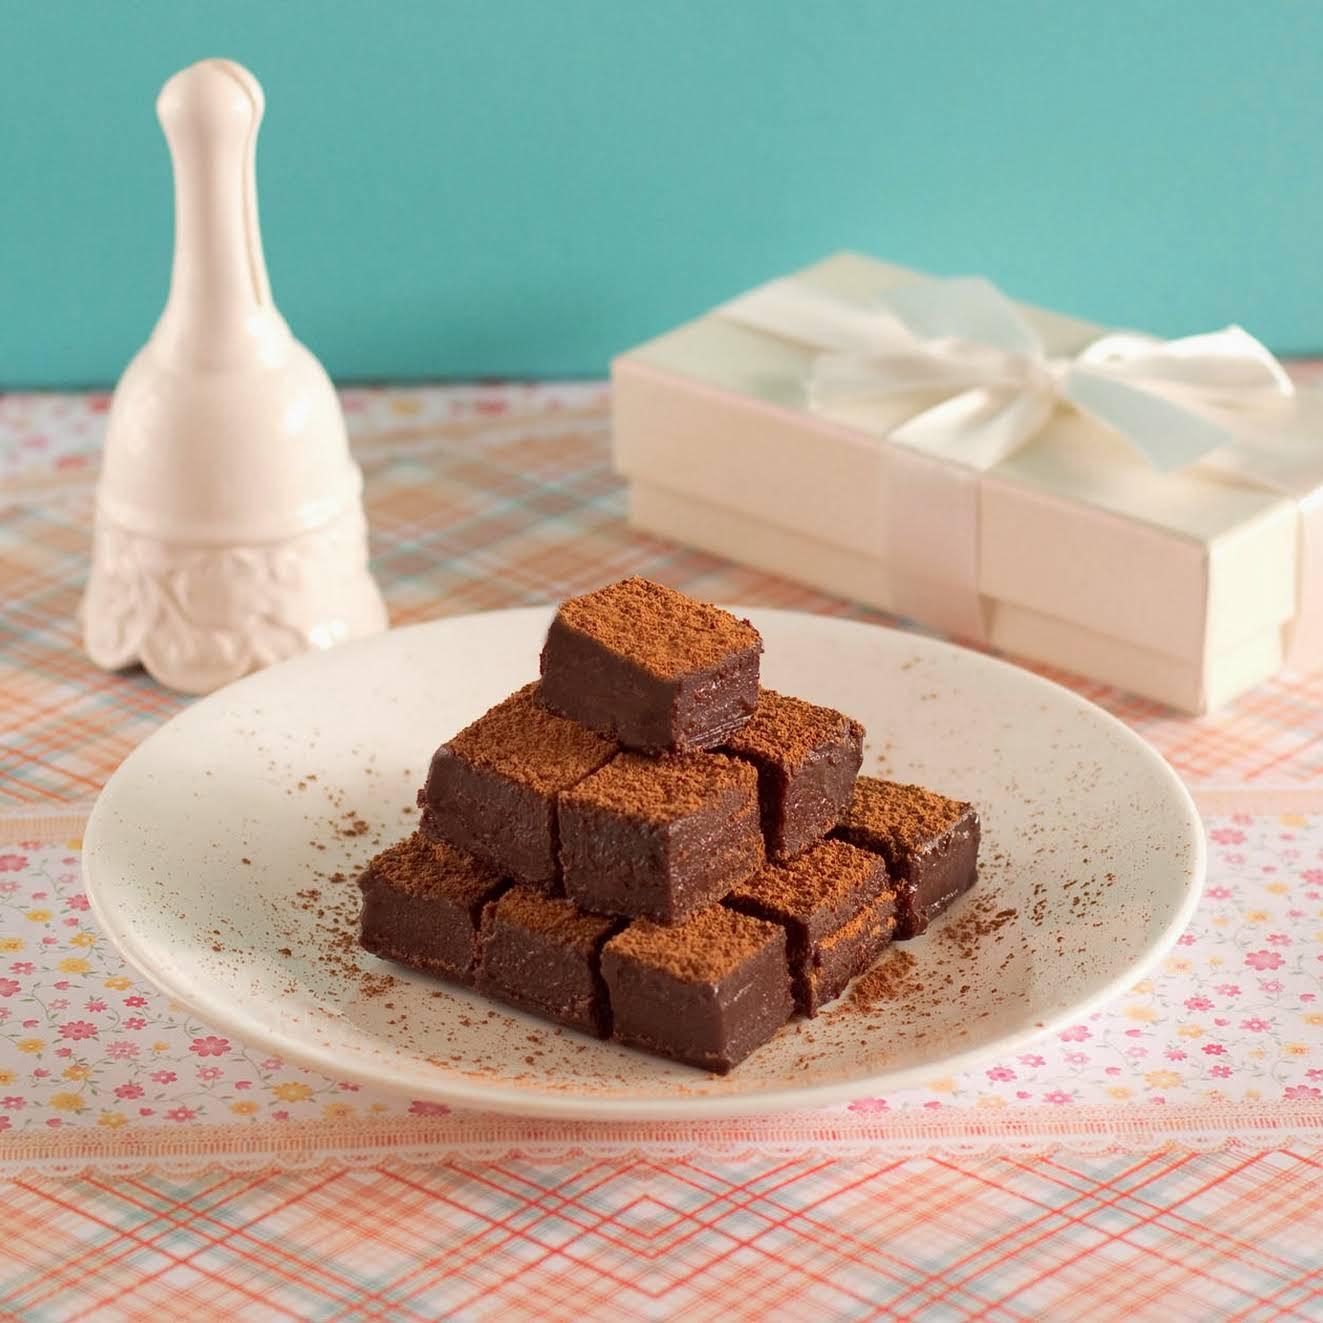 Nama Chocolate 日本生巧克力(生 チョコレート)